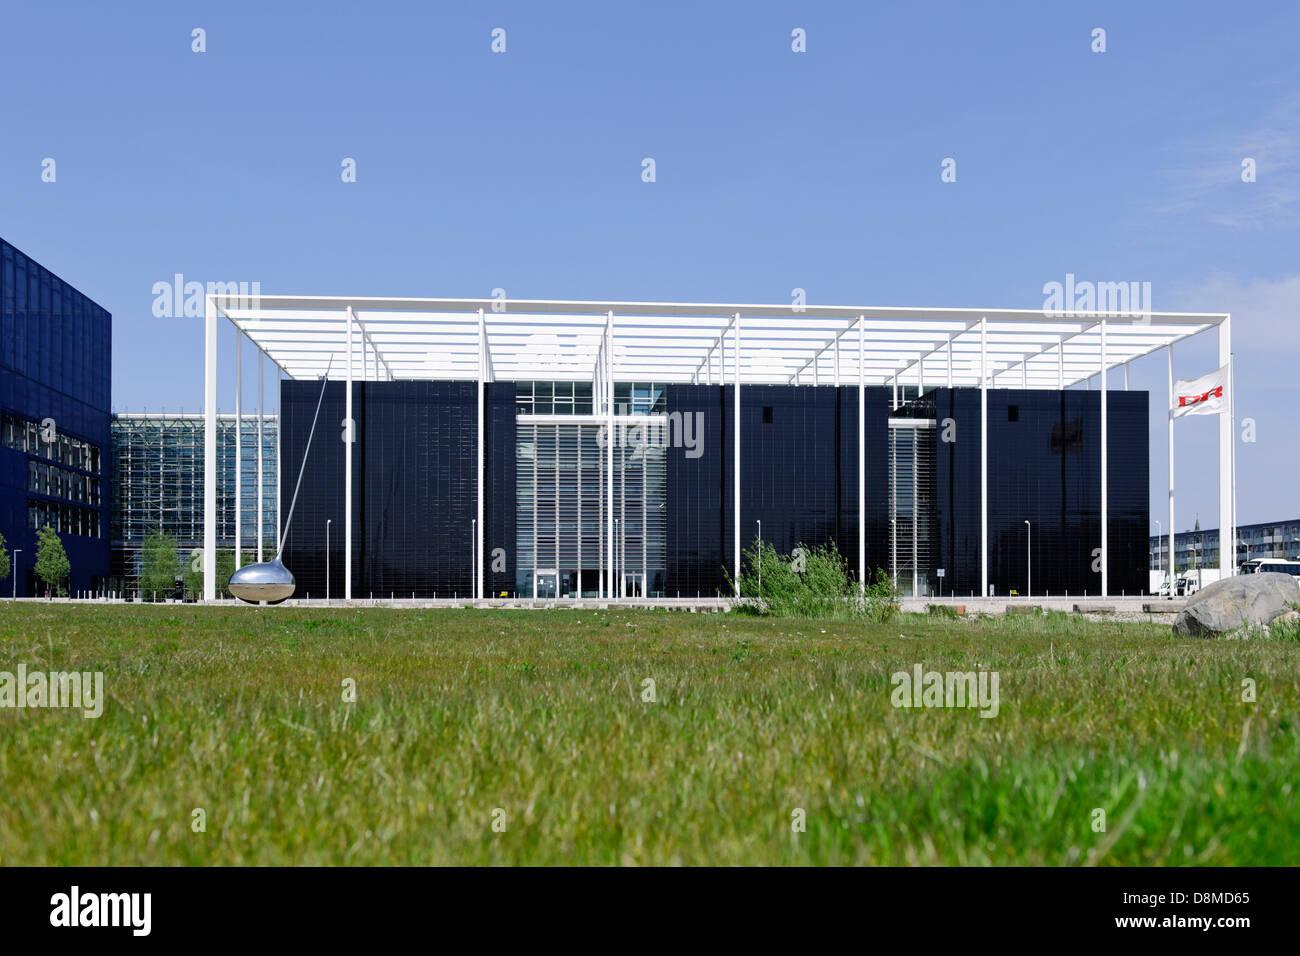 Modern architecture, Ørestad, island of Amager, Copenhagen, Denmark - Stock Image